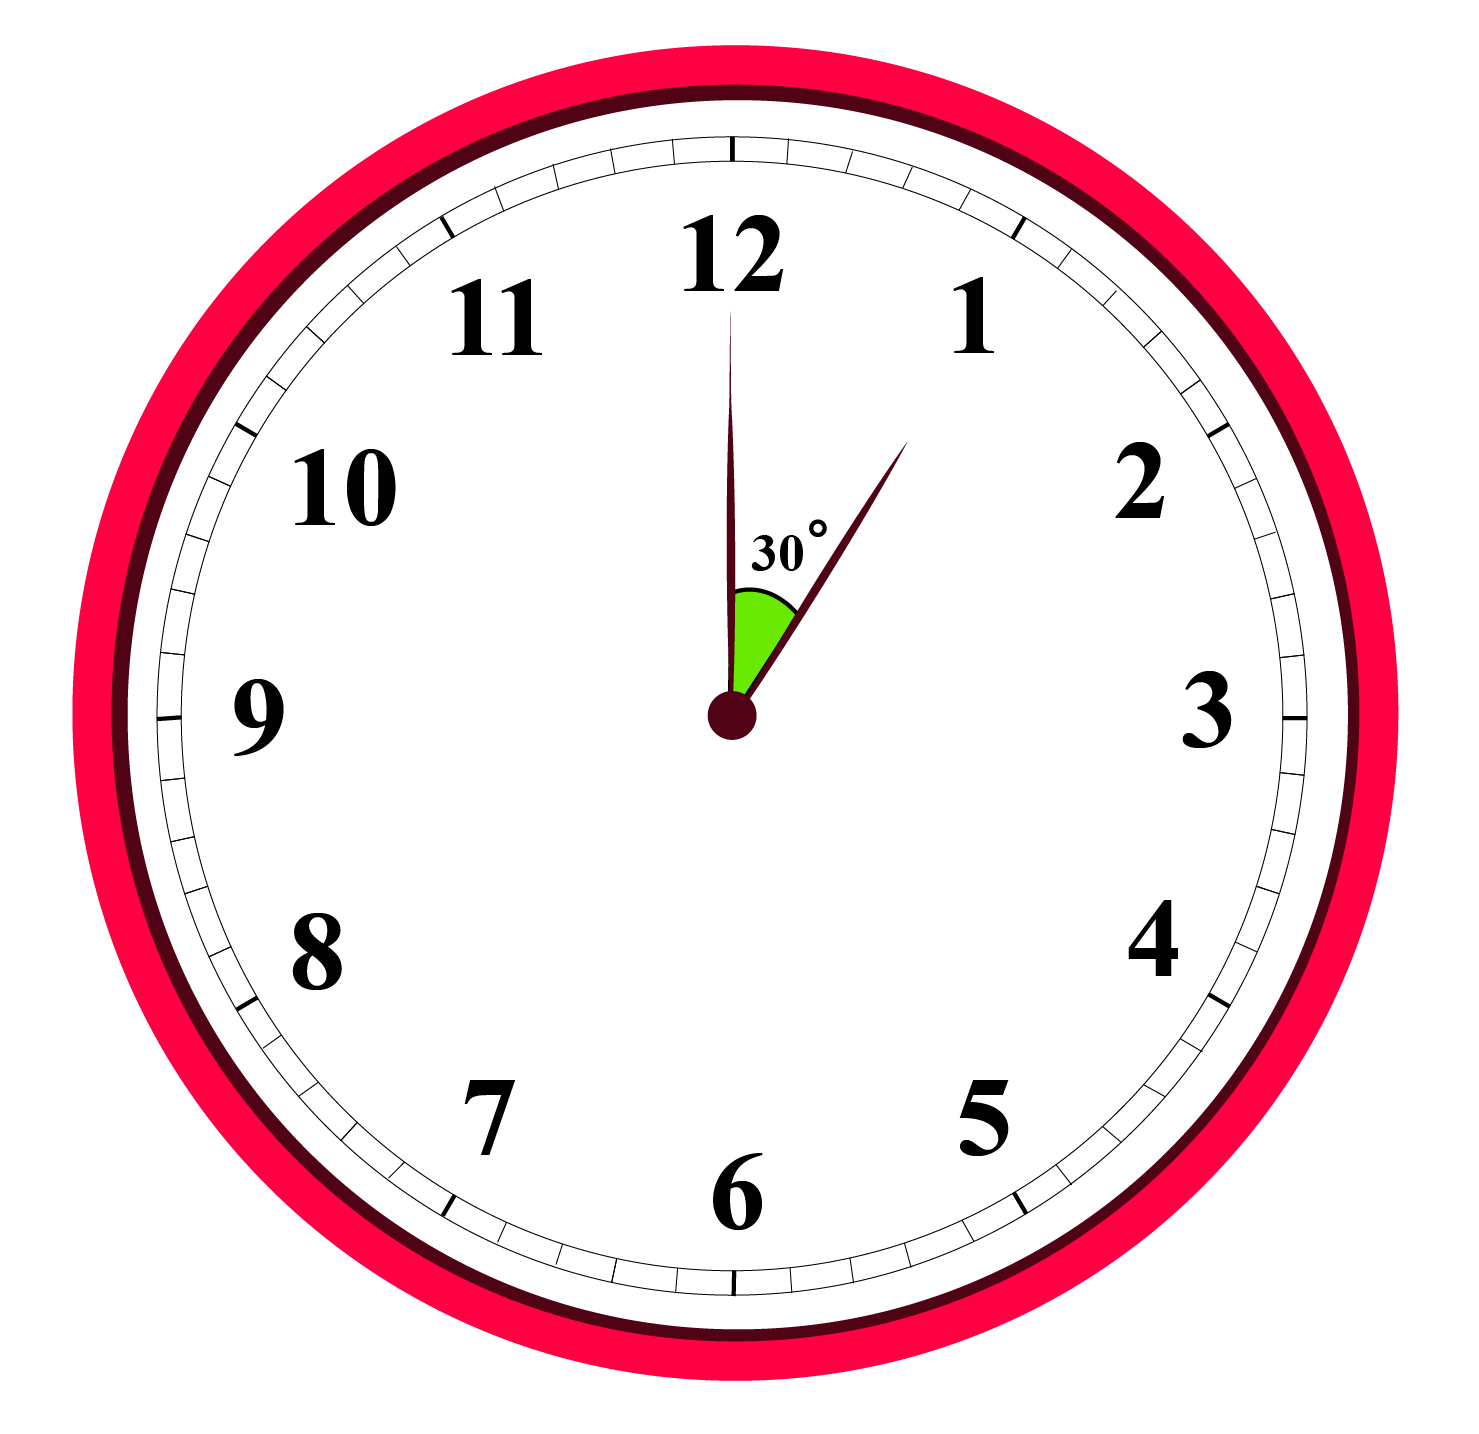 30-degree angle on a clock